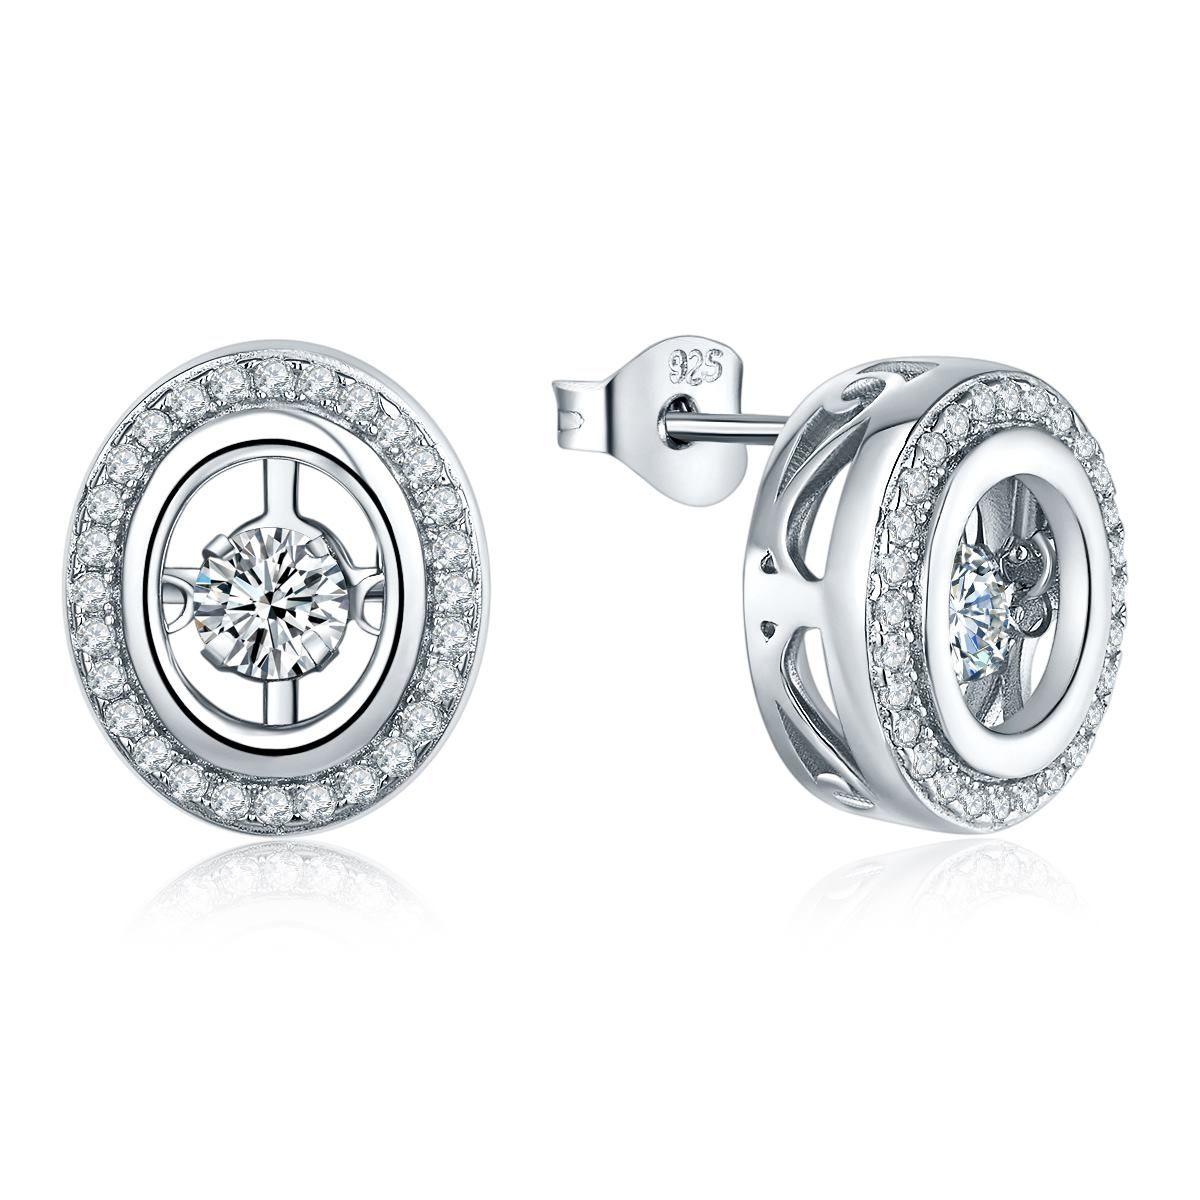 Dancing Style Diamond Cz Women Jewelry 925 Sterling Silver Stud Earrings  High Quality Hot Selling Silver Jewelry With 3a For Gift De16410g Dancing  Diamond